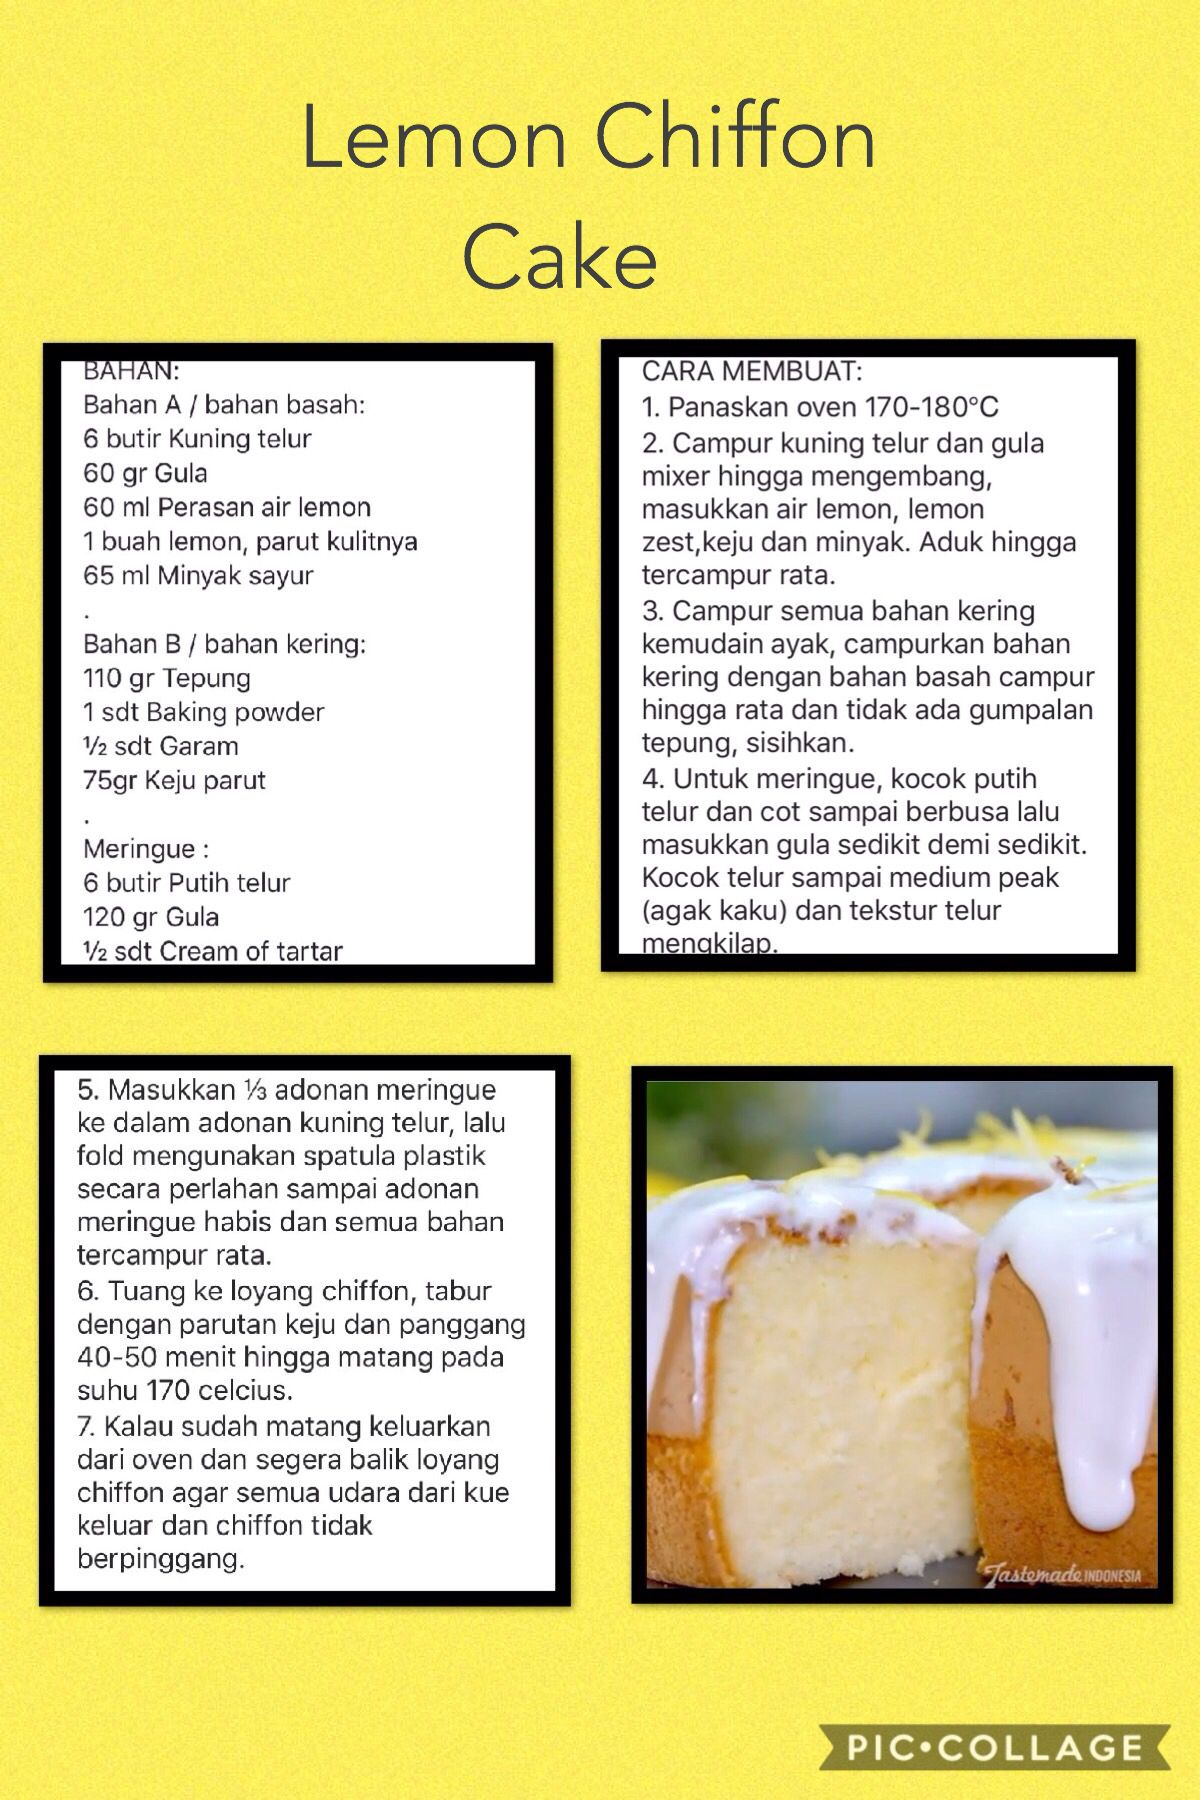 Lemon Chiffon Cake Makanan Resep Resep Kue